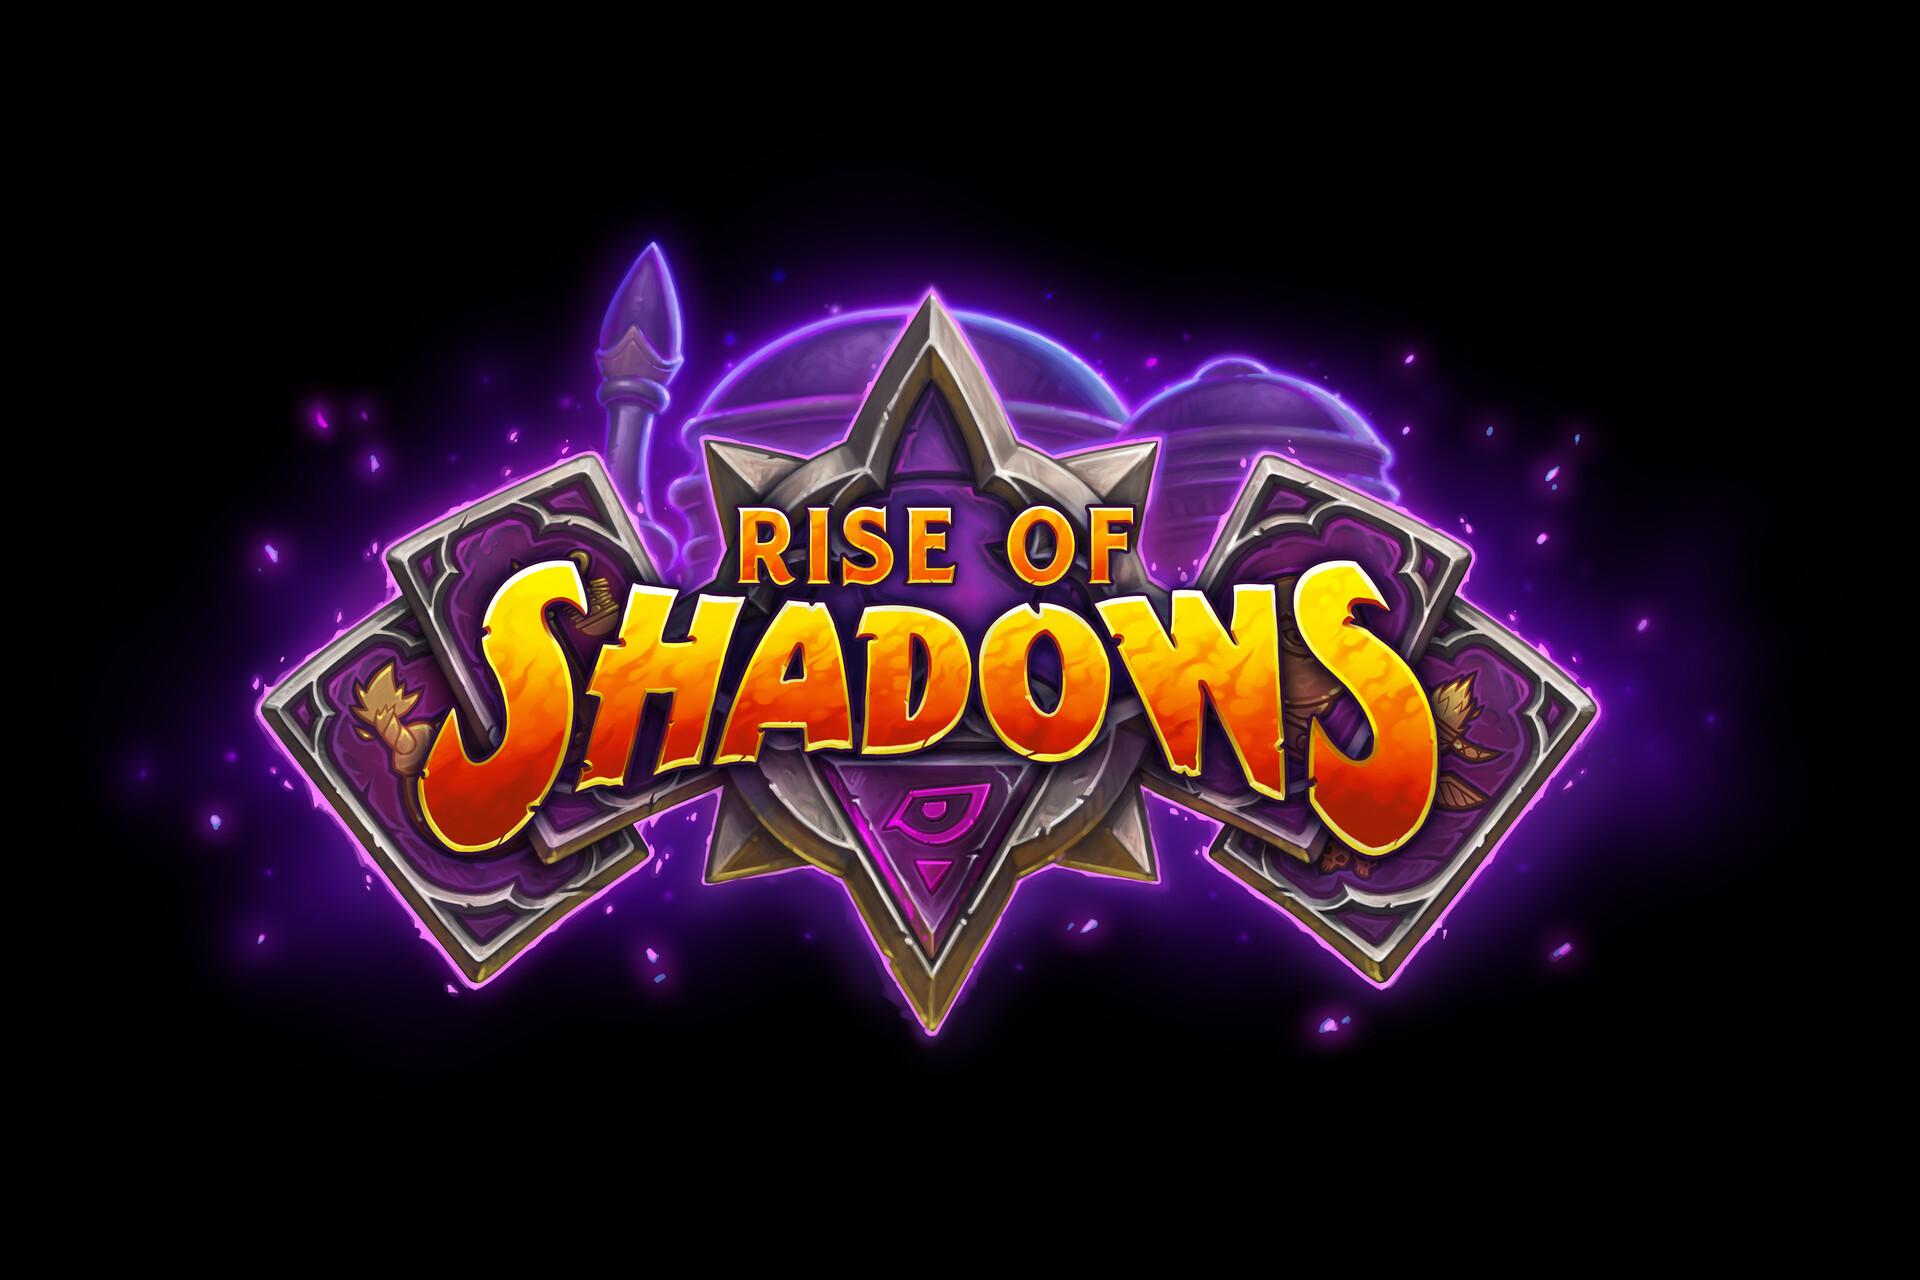 Christopher Hayes Hearthstone Rise Of Shadows Logo Gambar baru diunggah setiap minggu. christopher hayes hearthstone rise